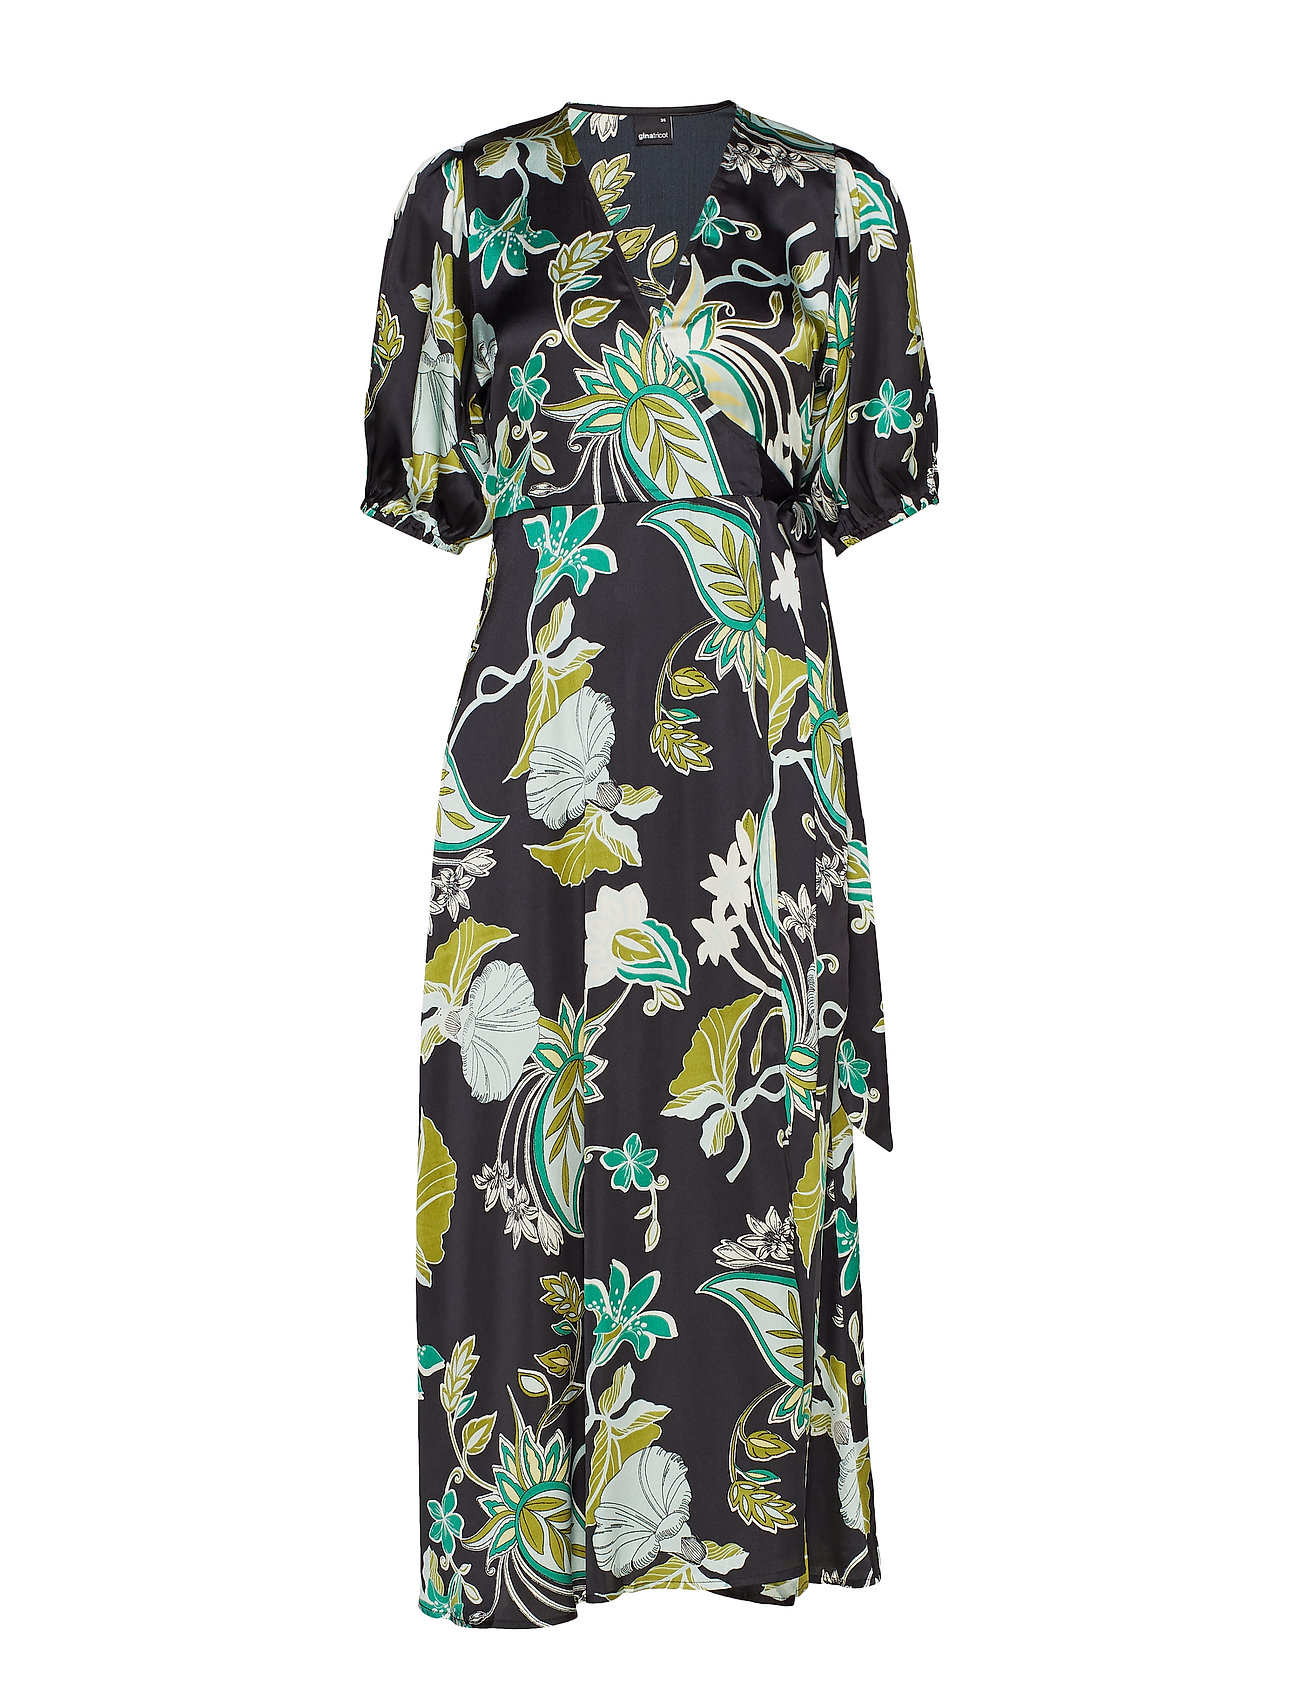 Gina Tricot Dita wrap dress - GREEN PAISLEY